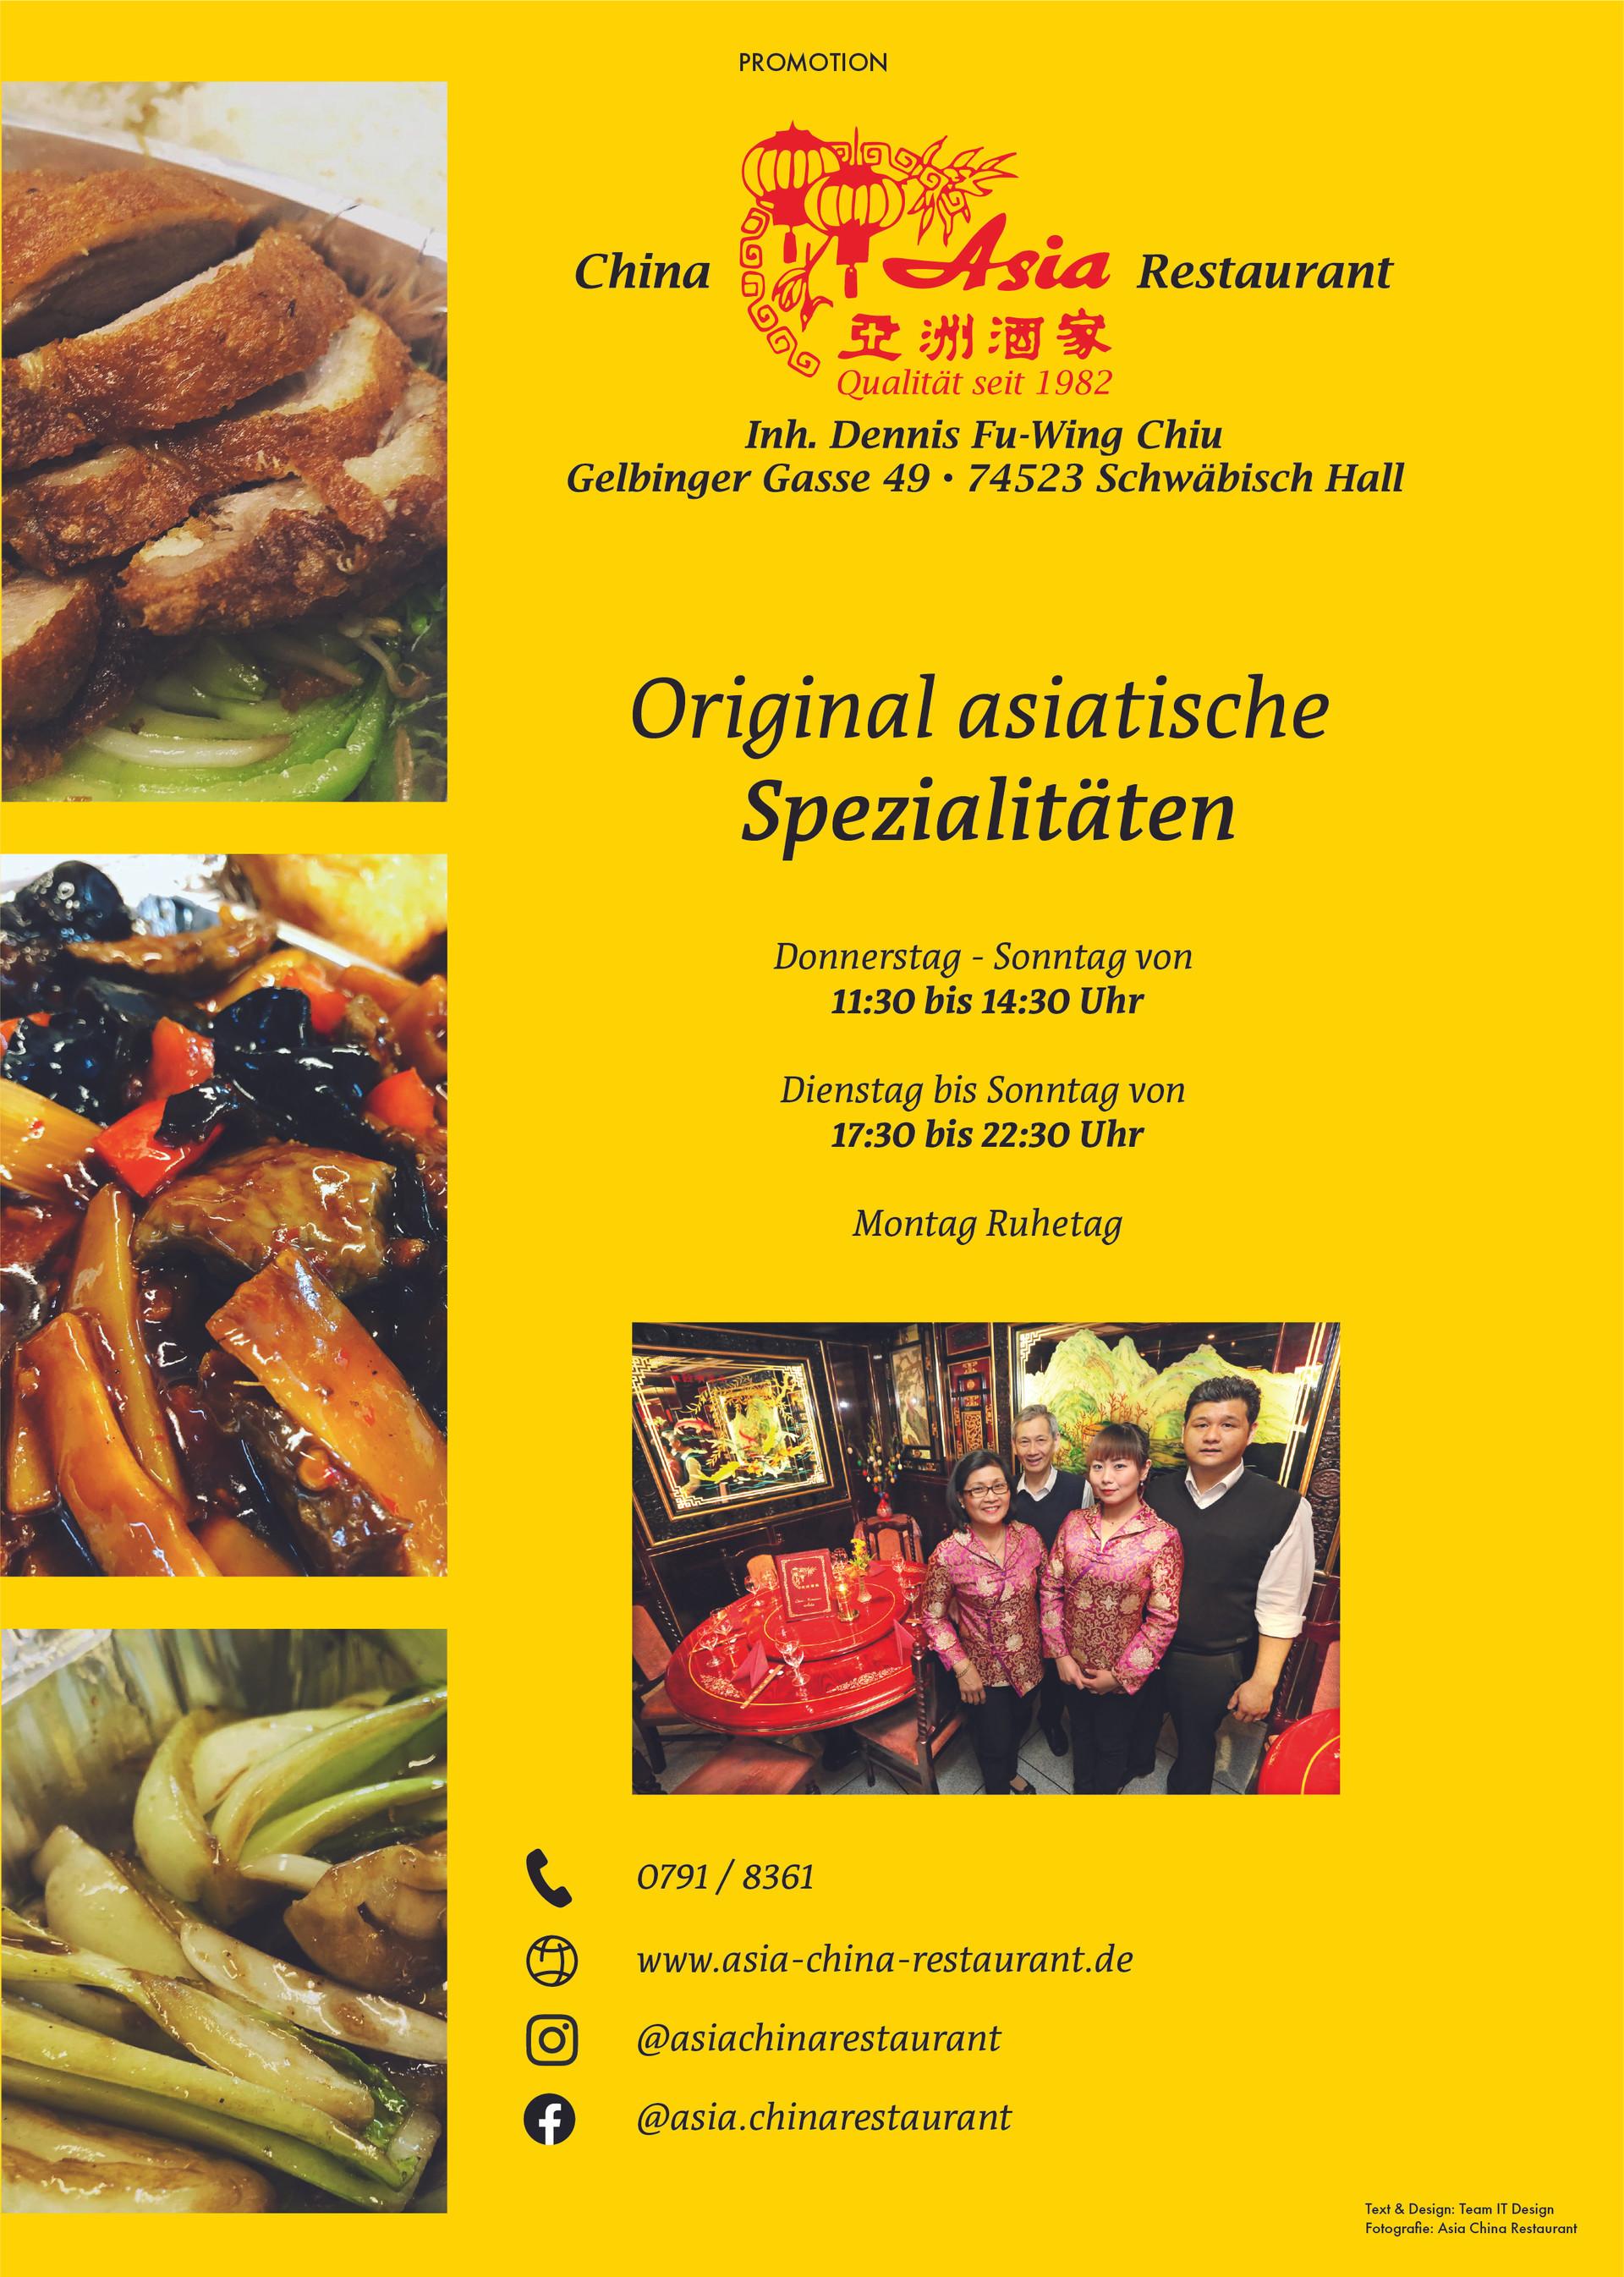 Asia China Restaurant Promotion